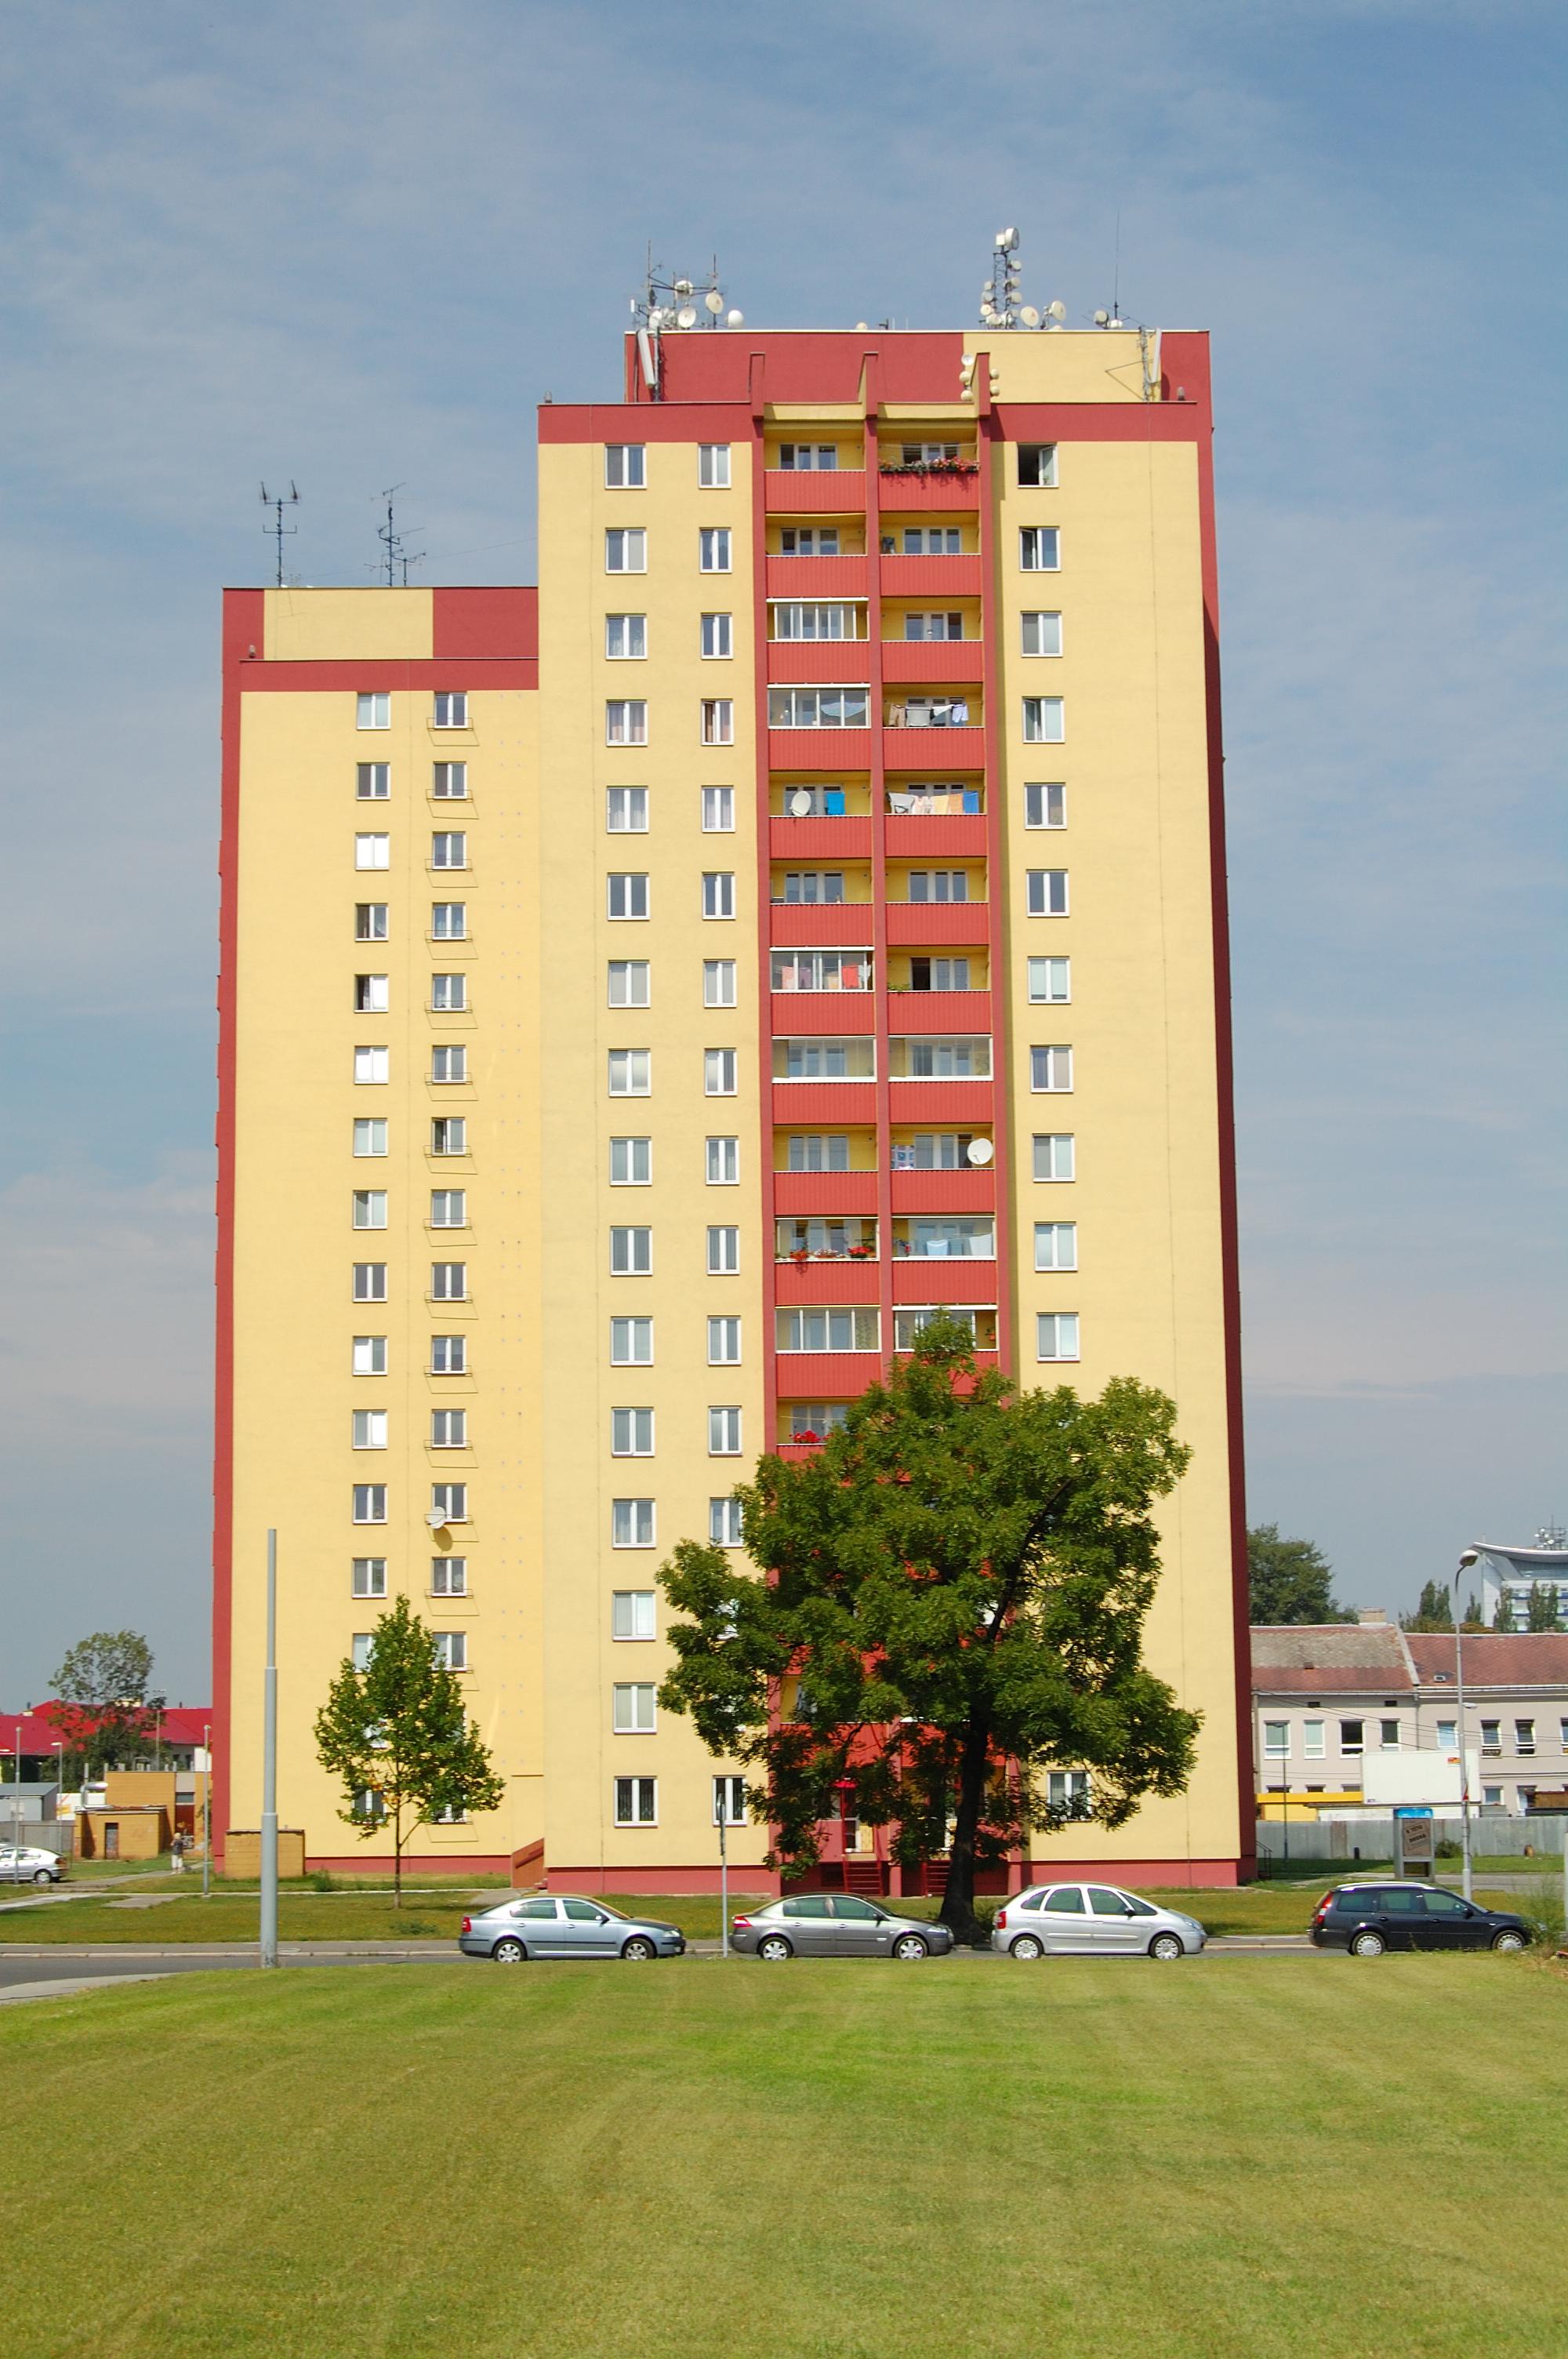 Rise Credit >> File:Panelak Ostrava 2009.JPG - Wikimedia Commons